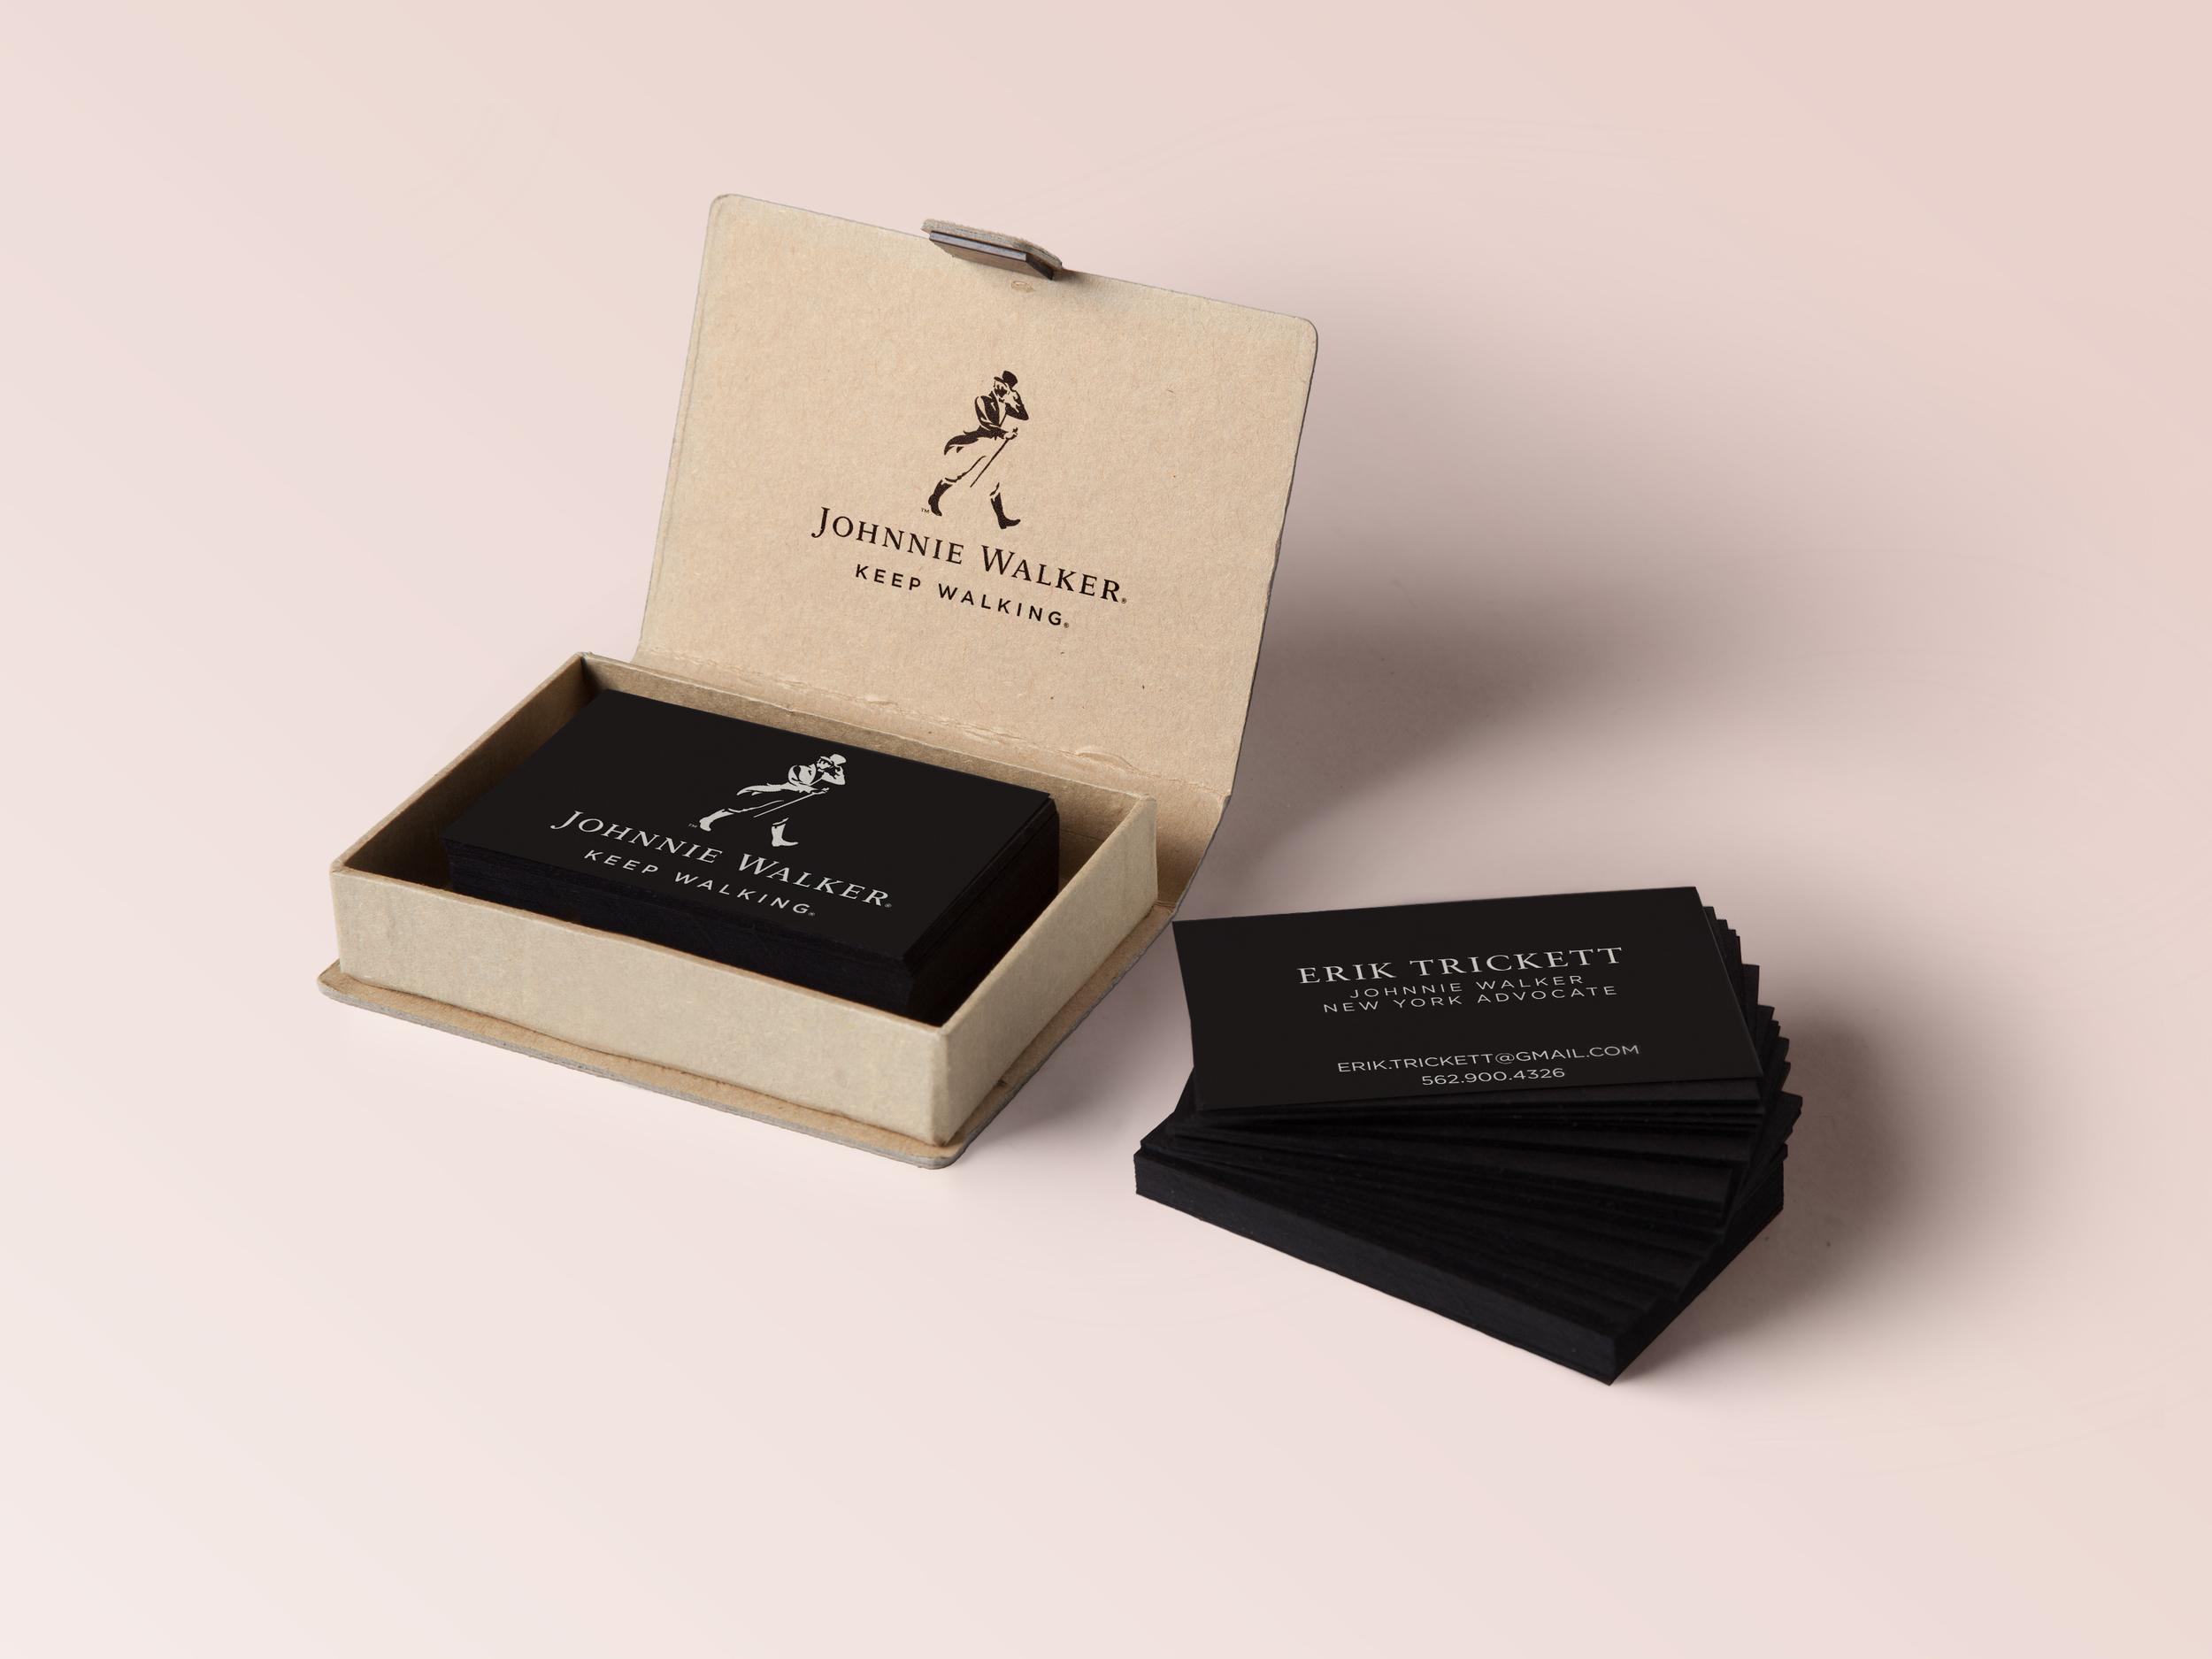 Johnnie Walker Ambassador Cards